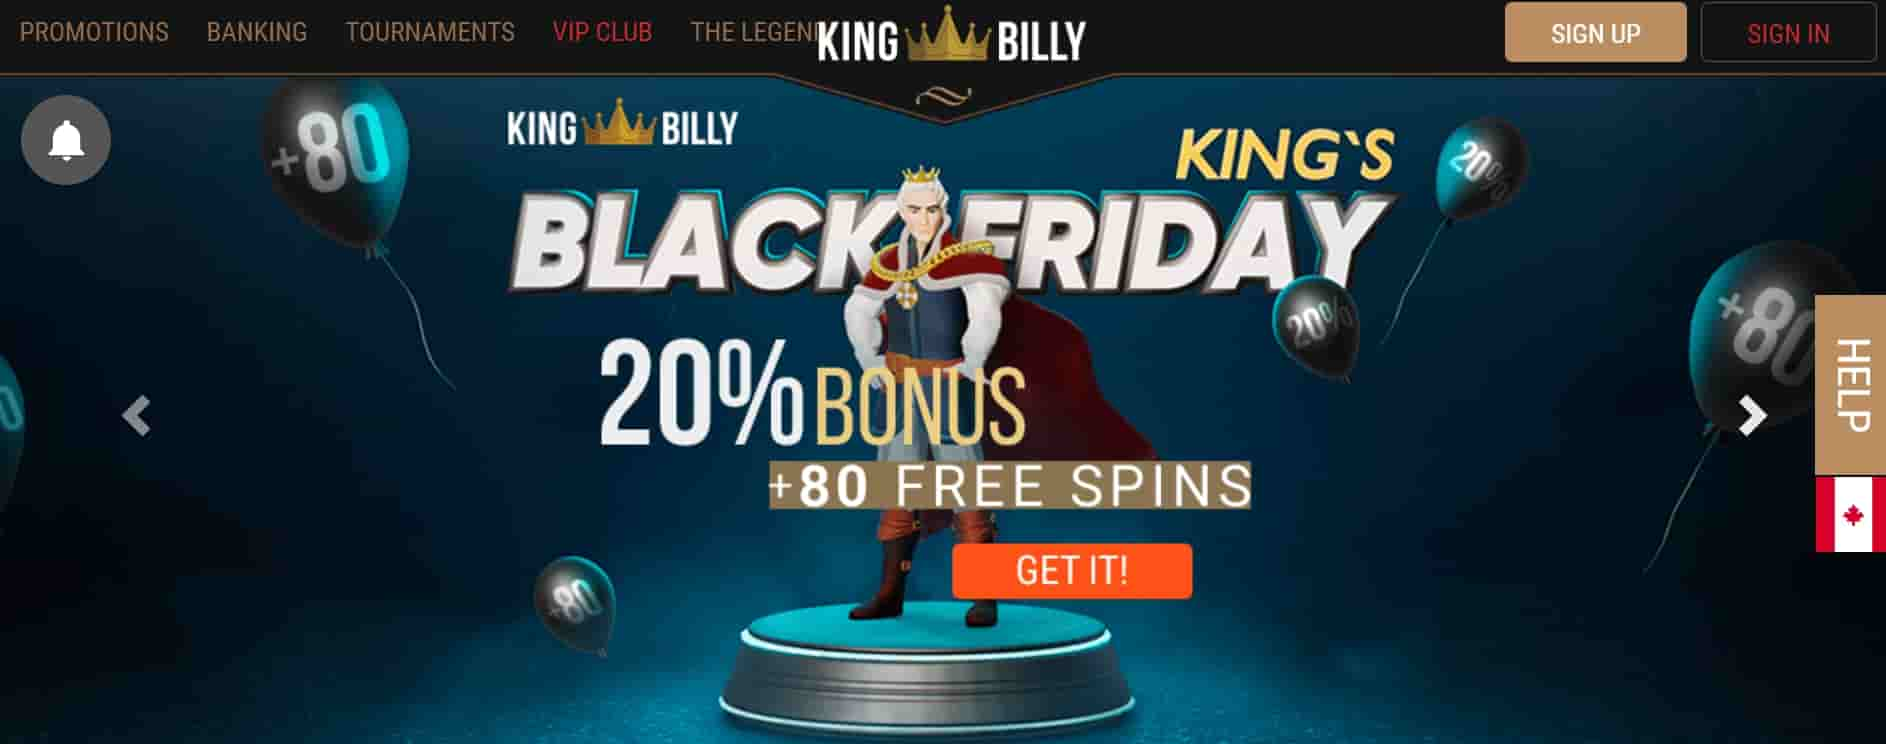 kingbilly casino promo